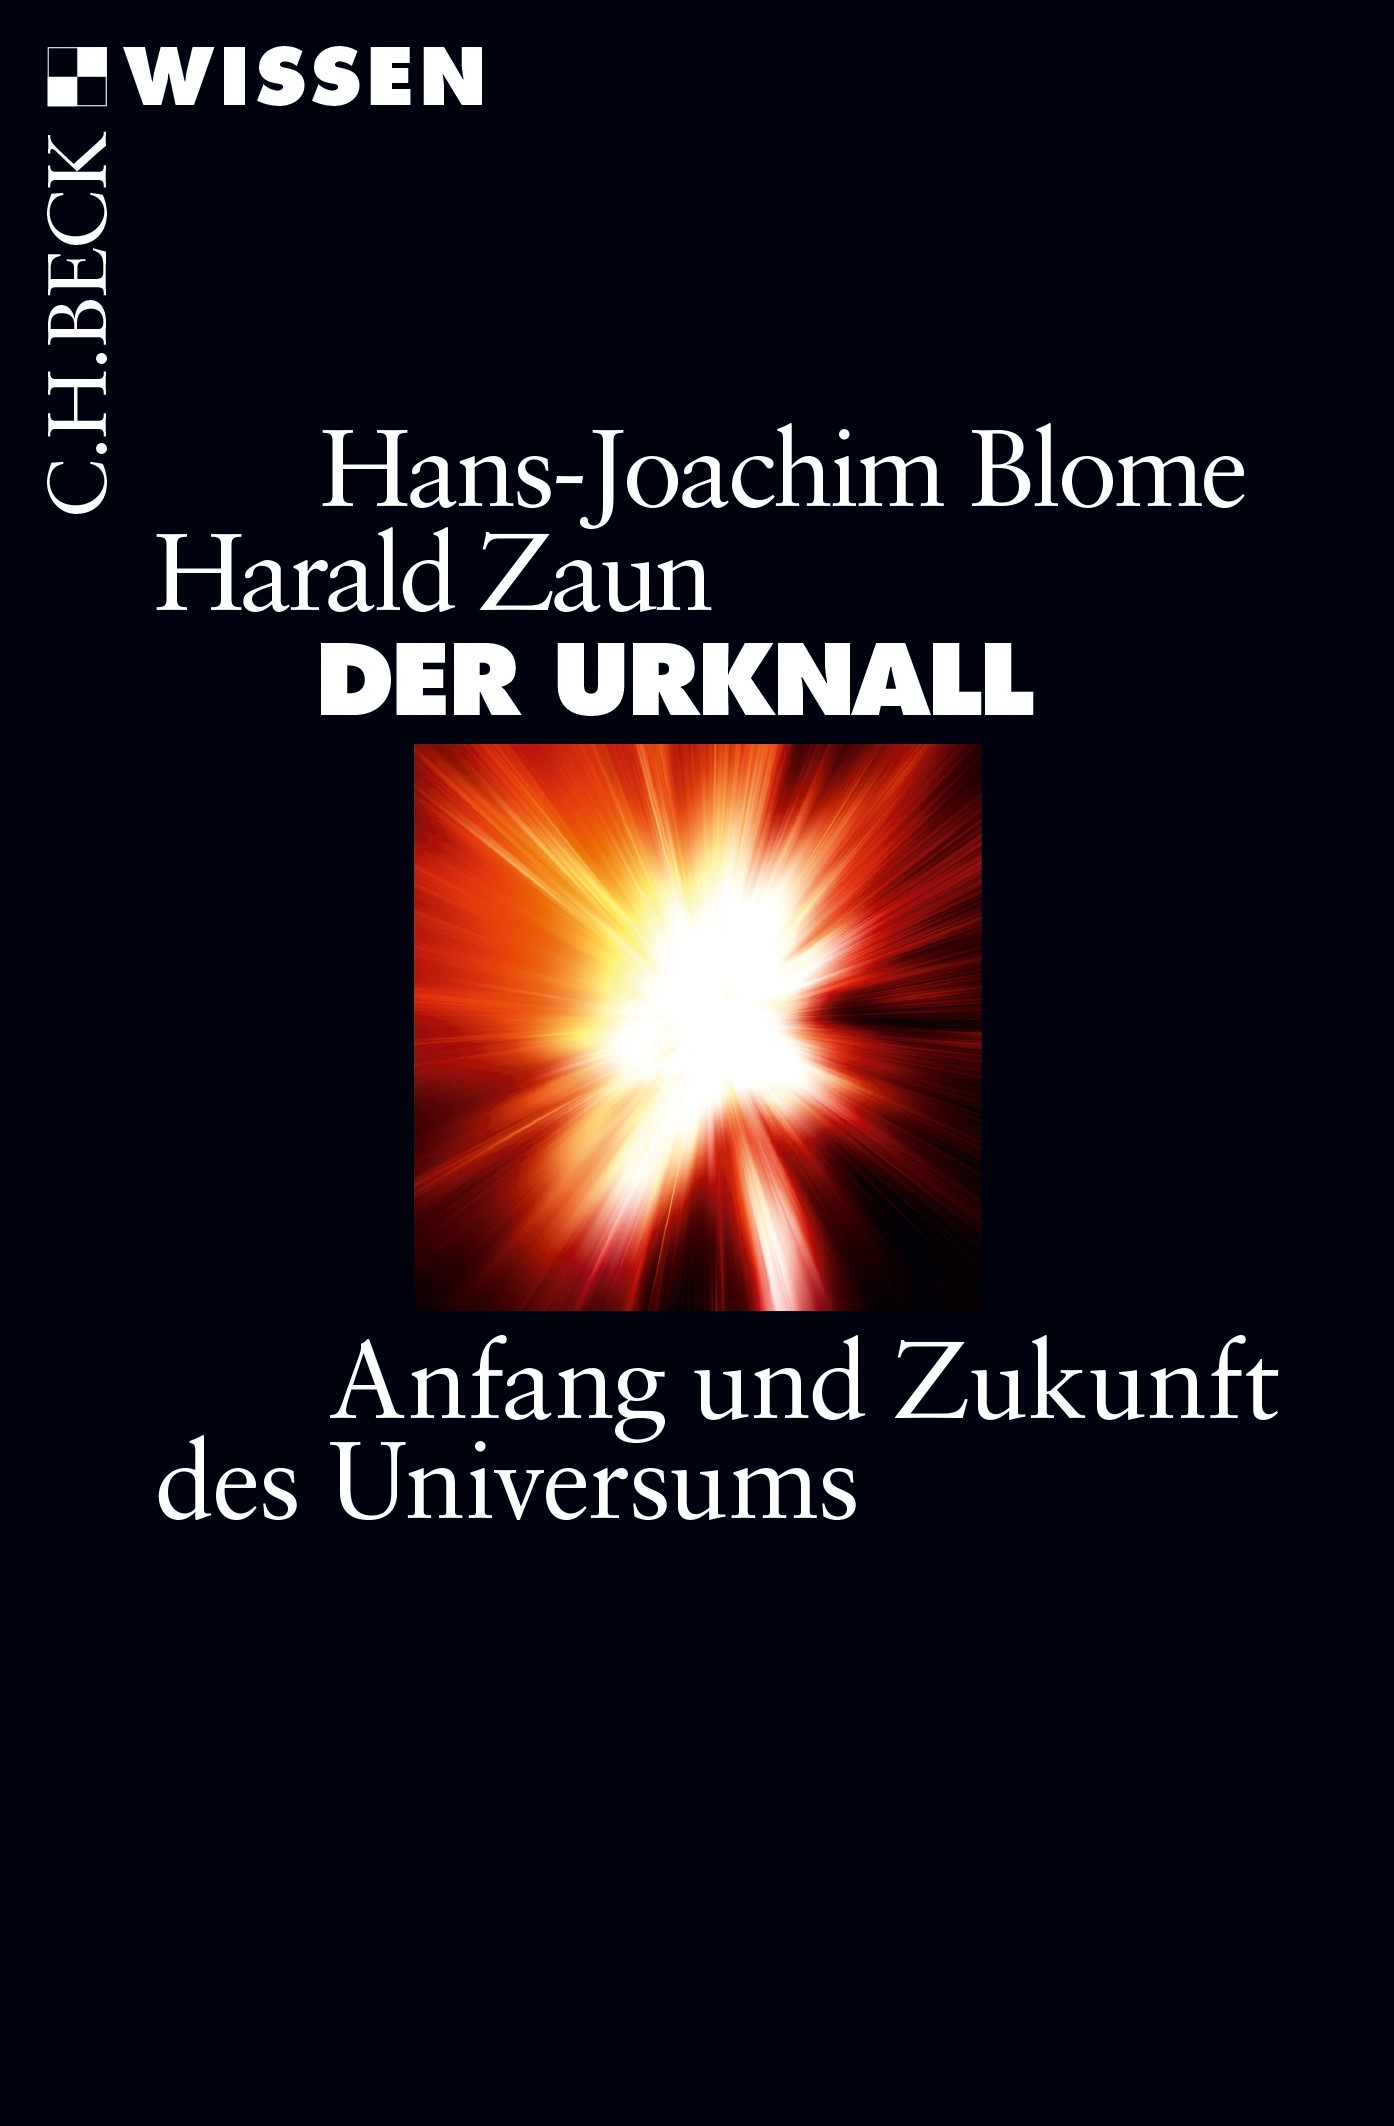 Der Urknall | Blome, Hans-Joachim / Zaun, Harald | 4., aktualisierte Auflage, 2018 | Buch (Cover)